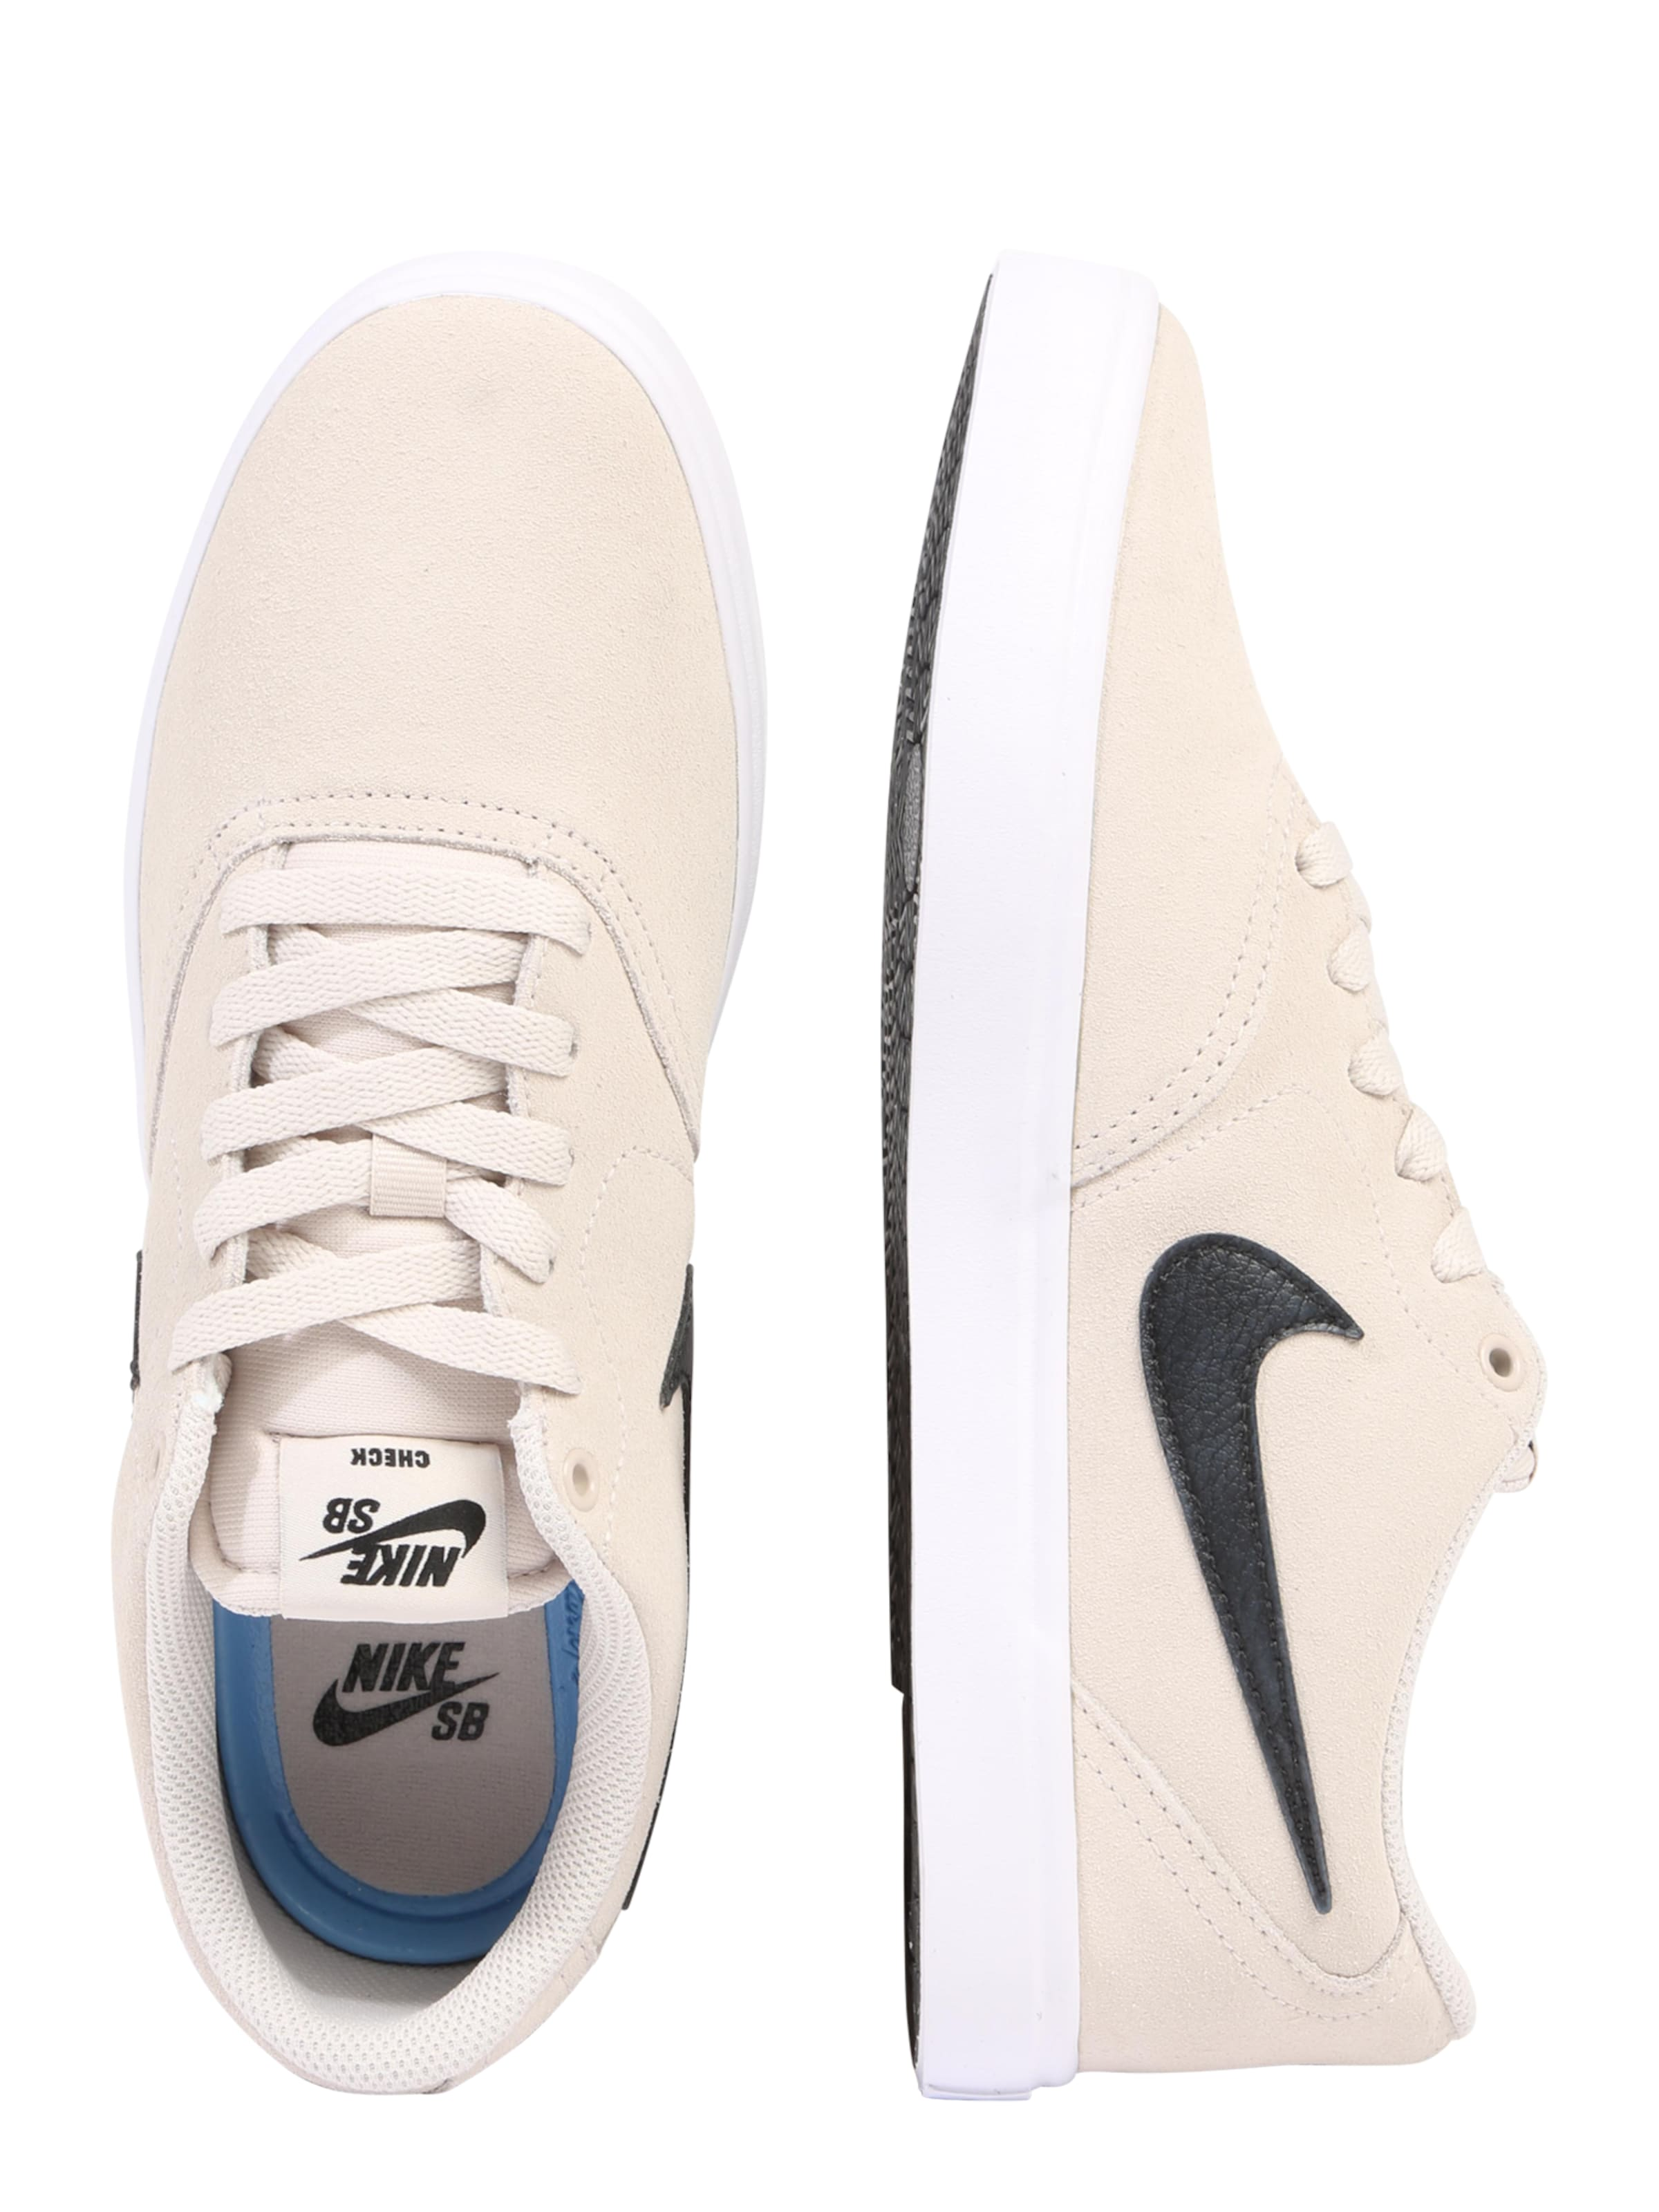 Sneaker 'check SandSchwarz Nike Sb Weiß In Solar' MUzSVGqp